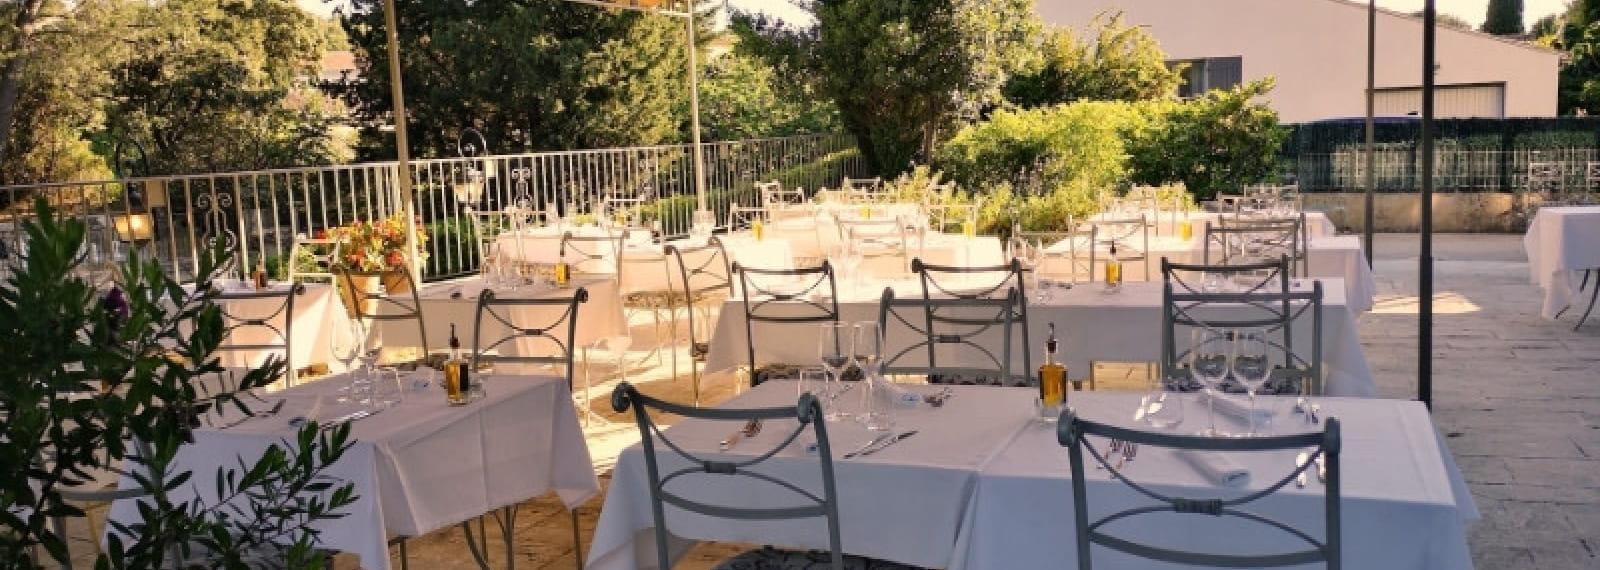 Hôtel Belesso - Restaurant Belvédère